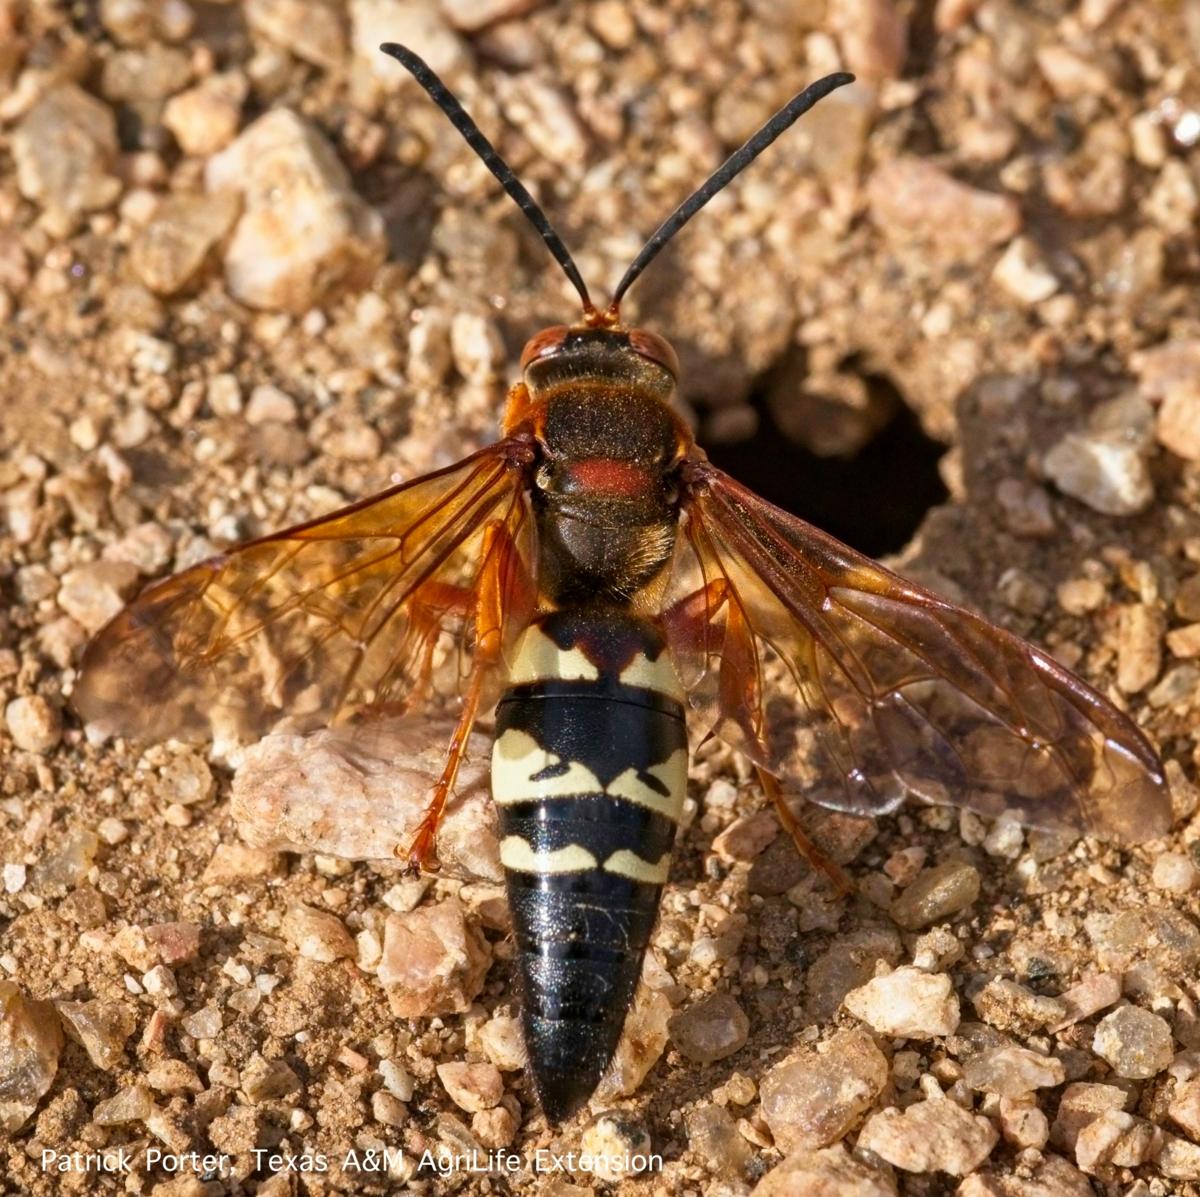 Cicada killer wasp and burrow entrance